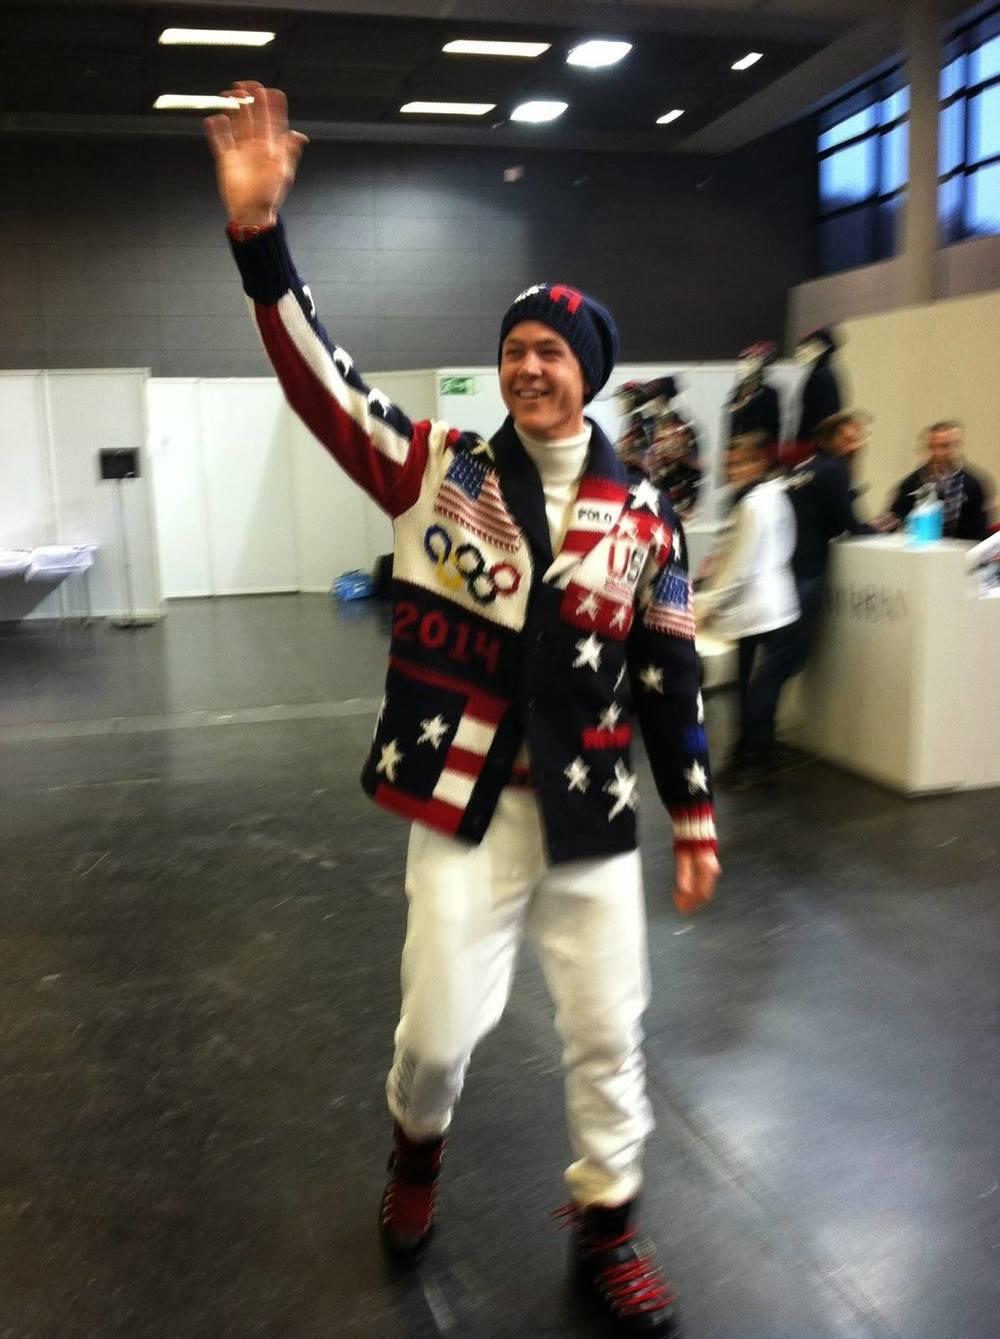 Olympic Ceremony Outfit _ Erik Bjornsen.jpg